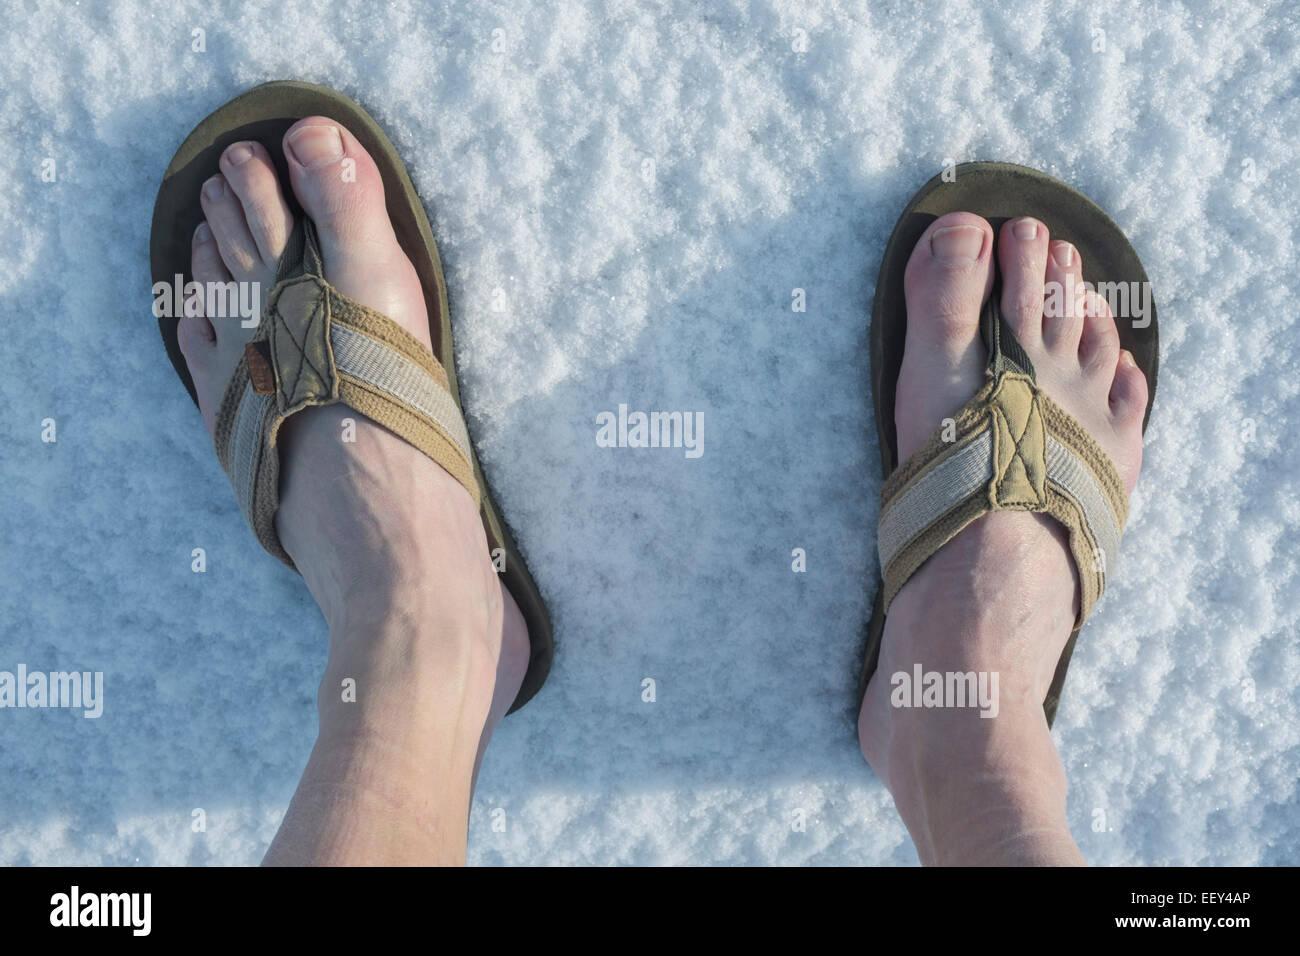 promo code 12590 7adf3 Barfuß in Flip-Flops im Schnee Stockfoto, Bild: 78042798 - Alamy